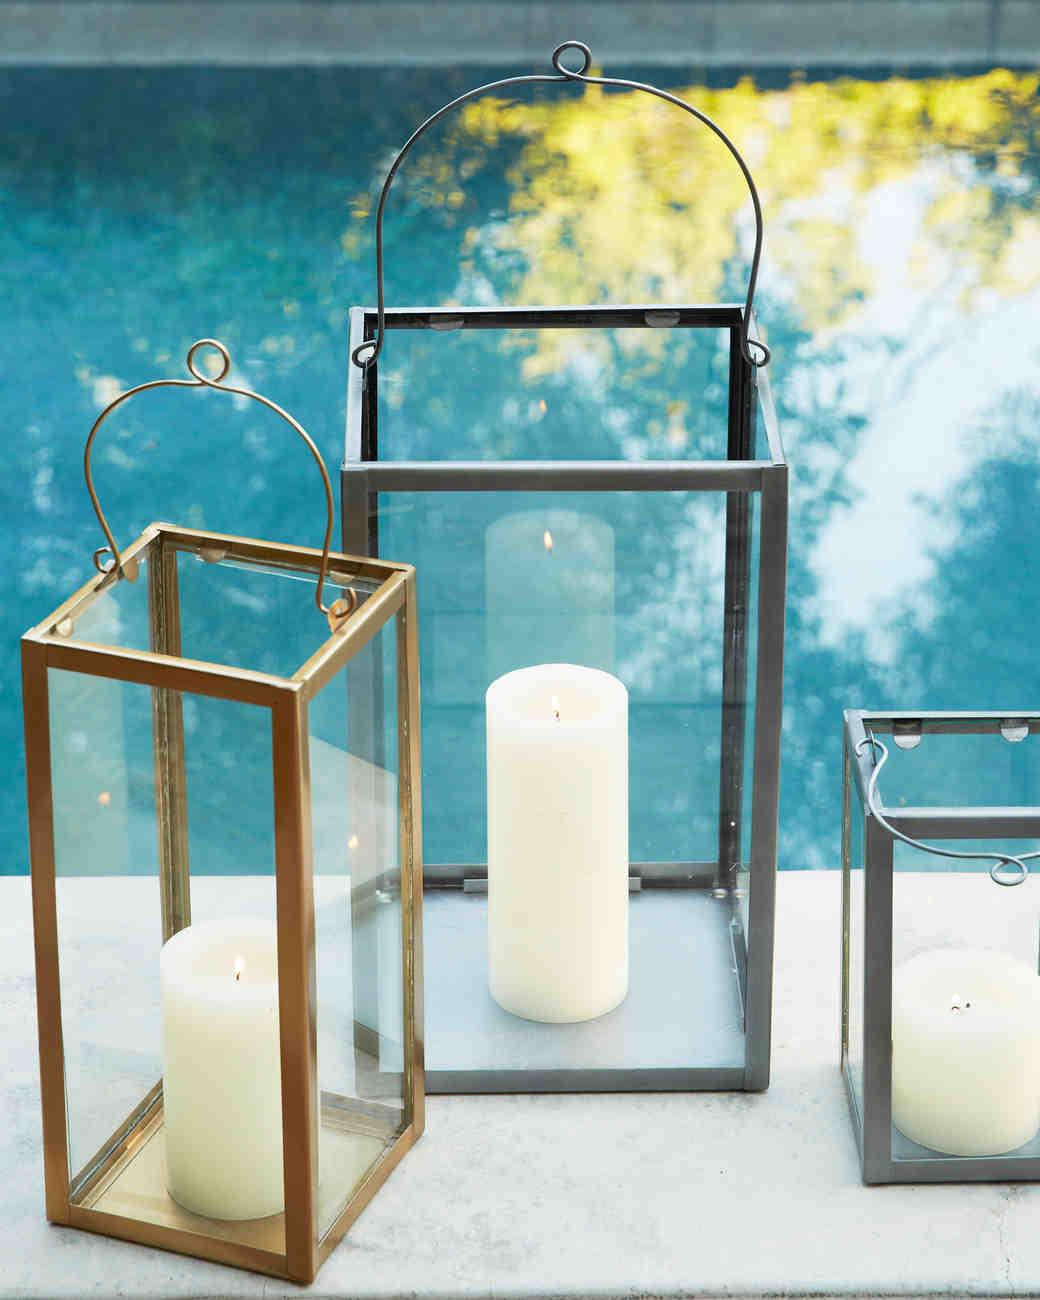 outdoor-registry-items-west-elm-lanterns-0814.jpg